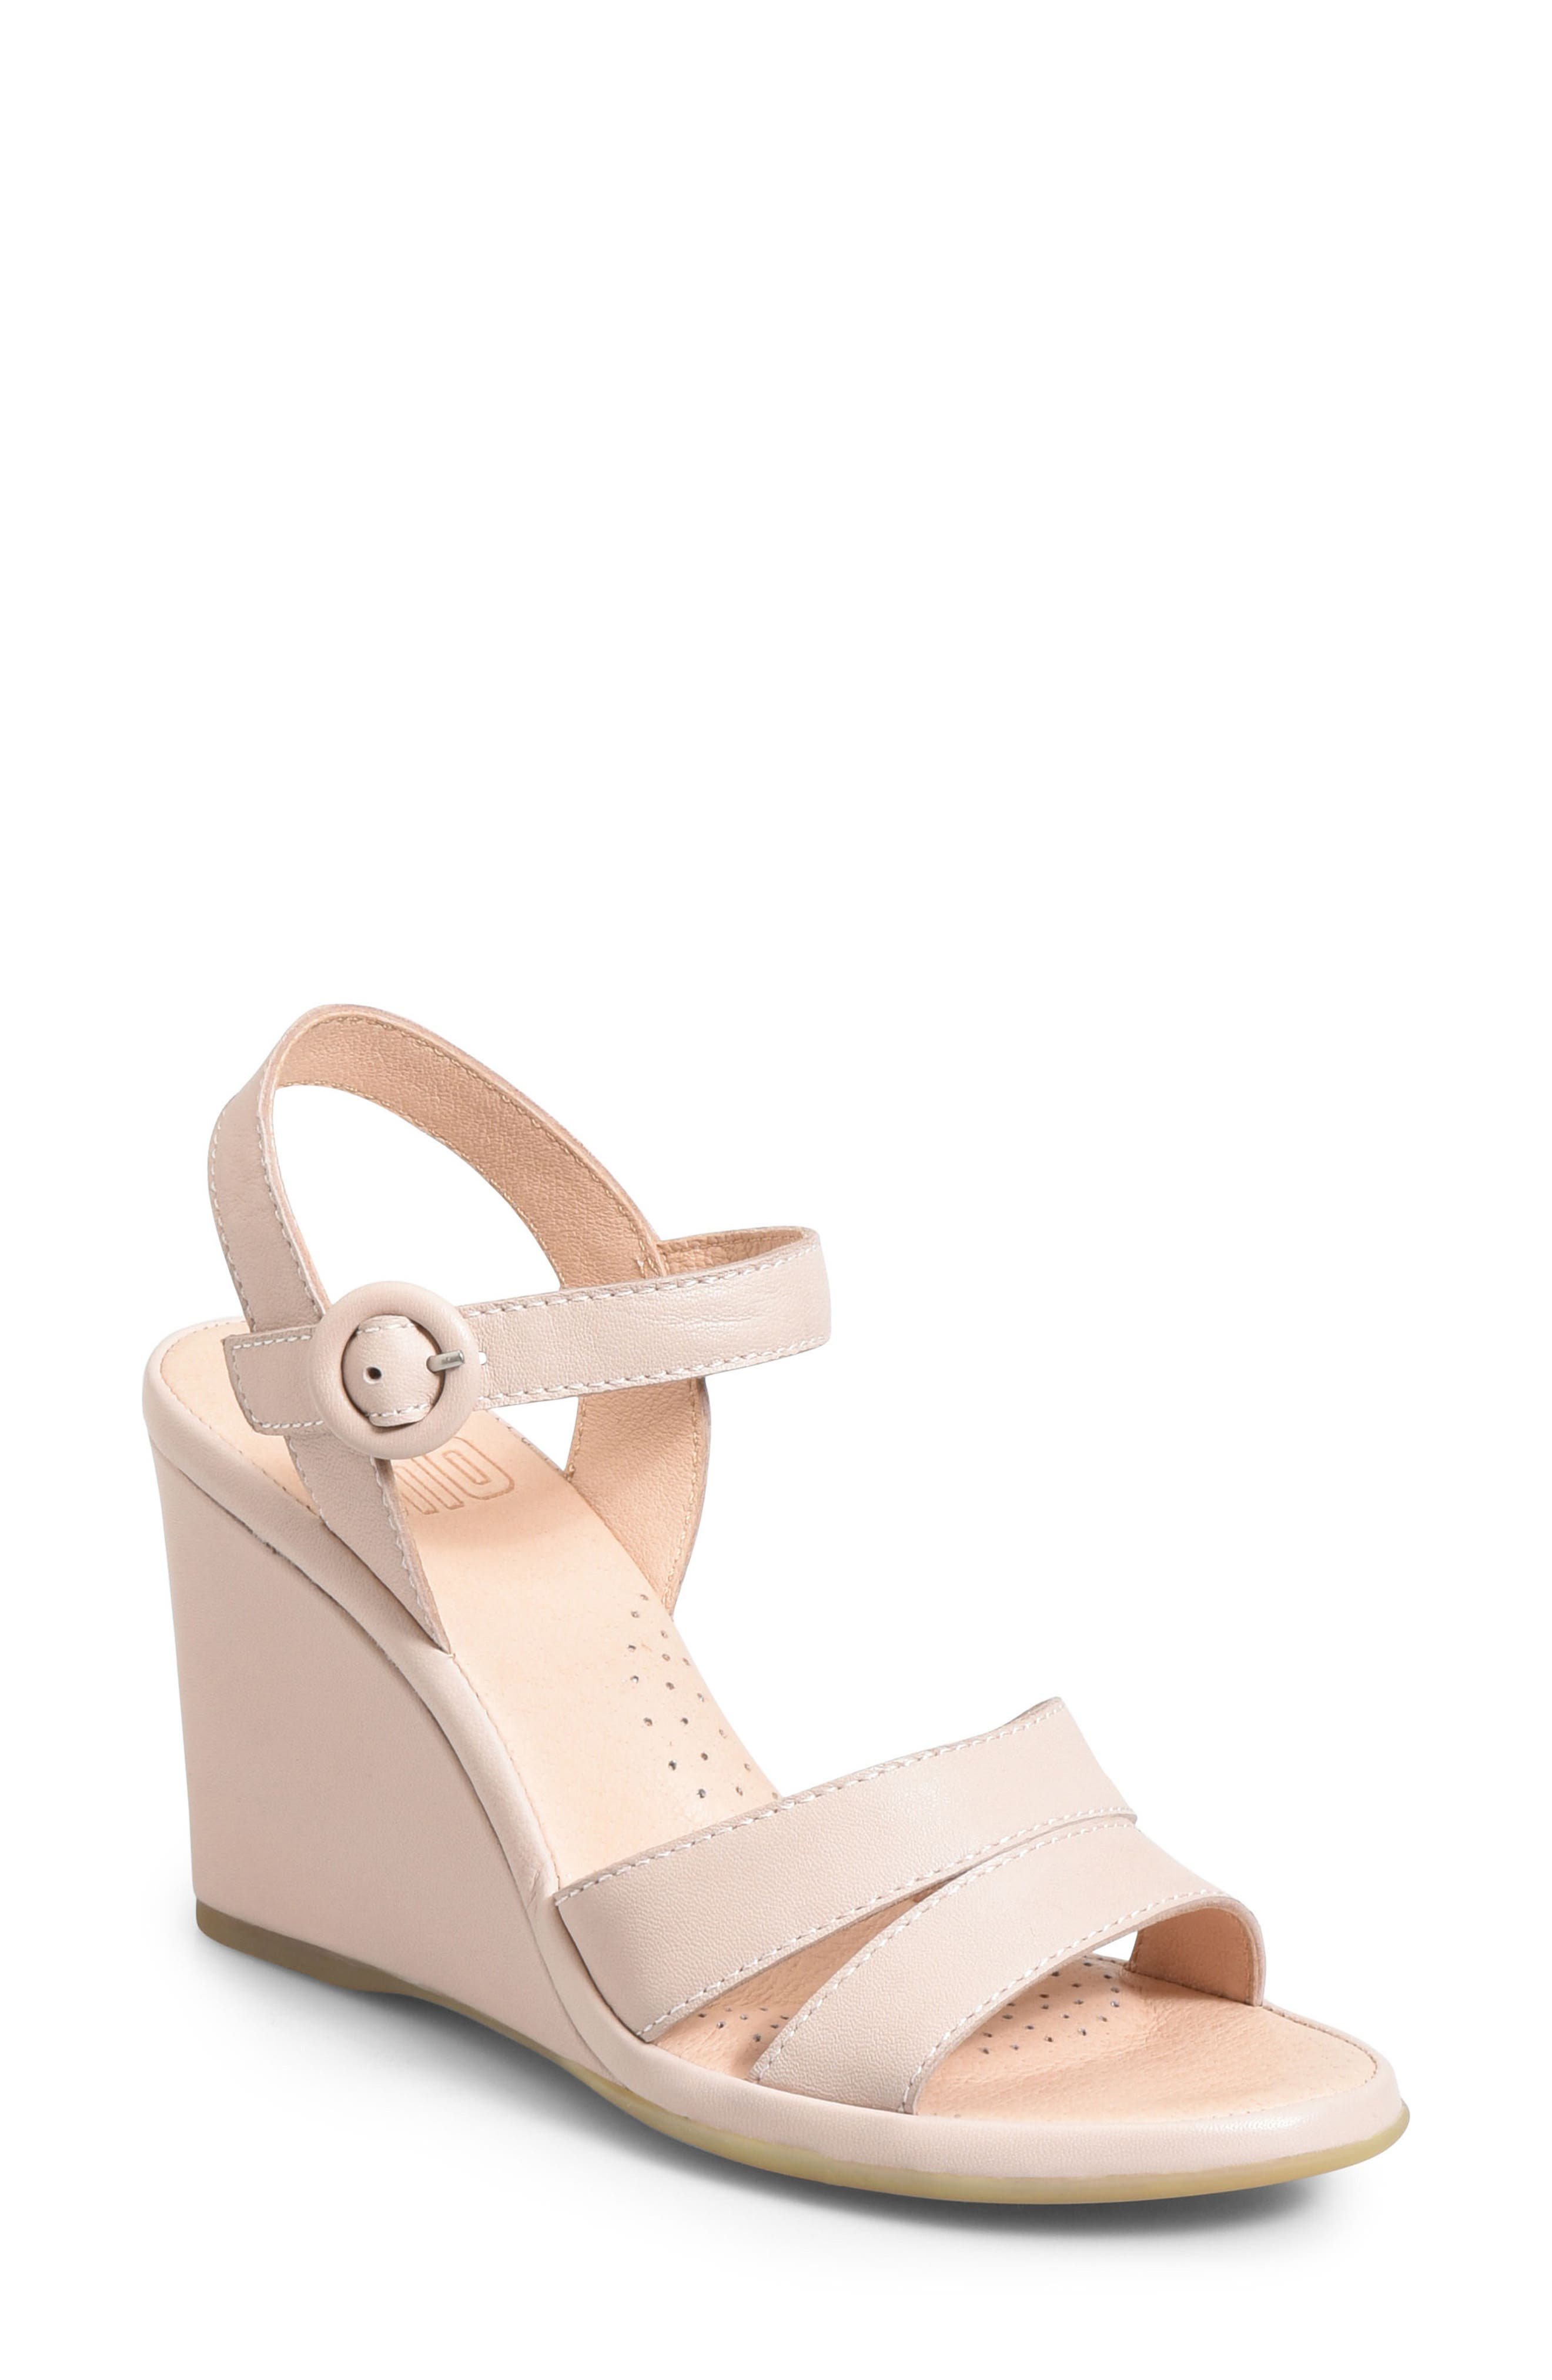 Ono Hydro Wedge Sandal, Pink